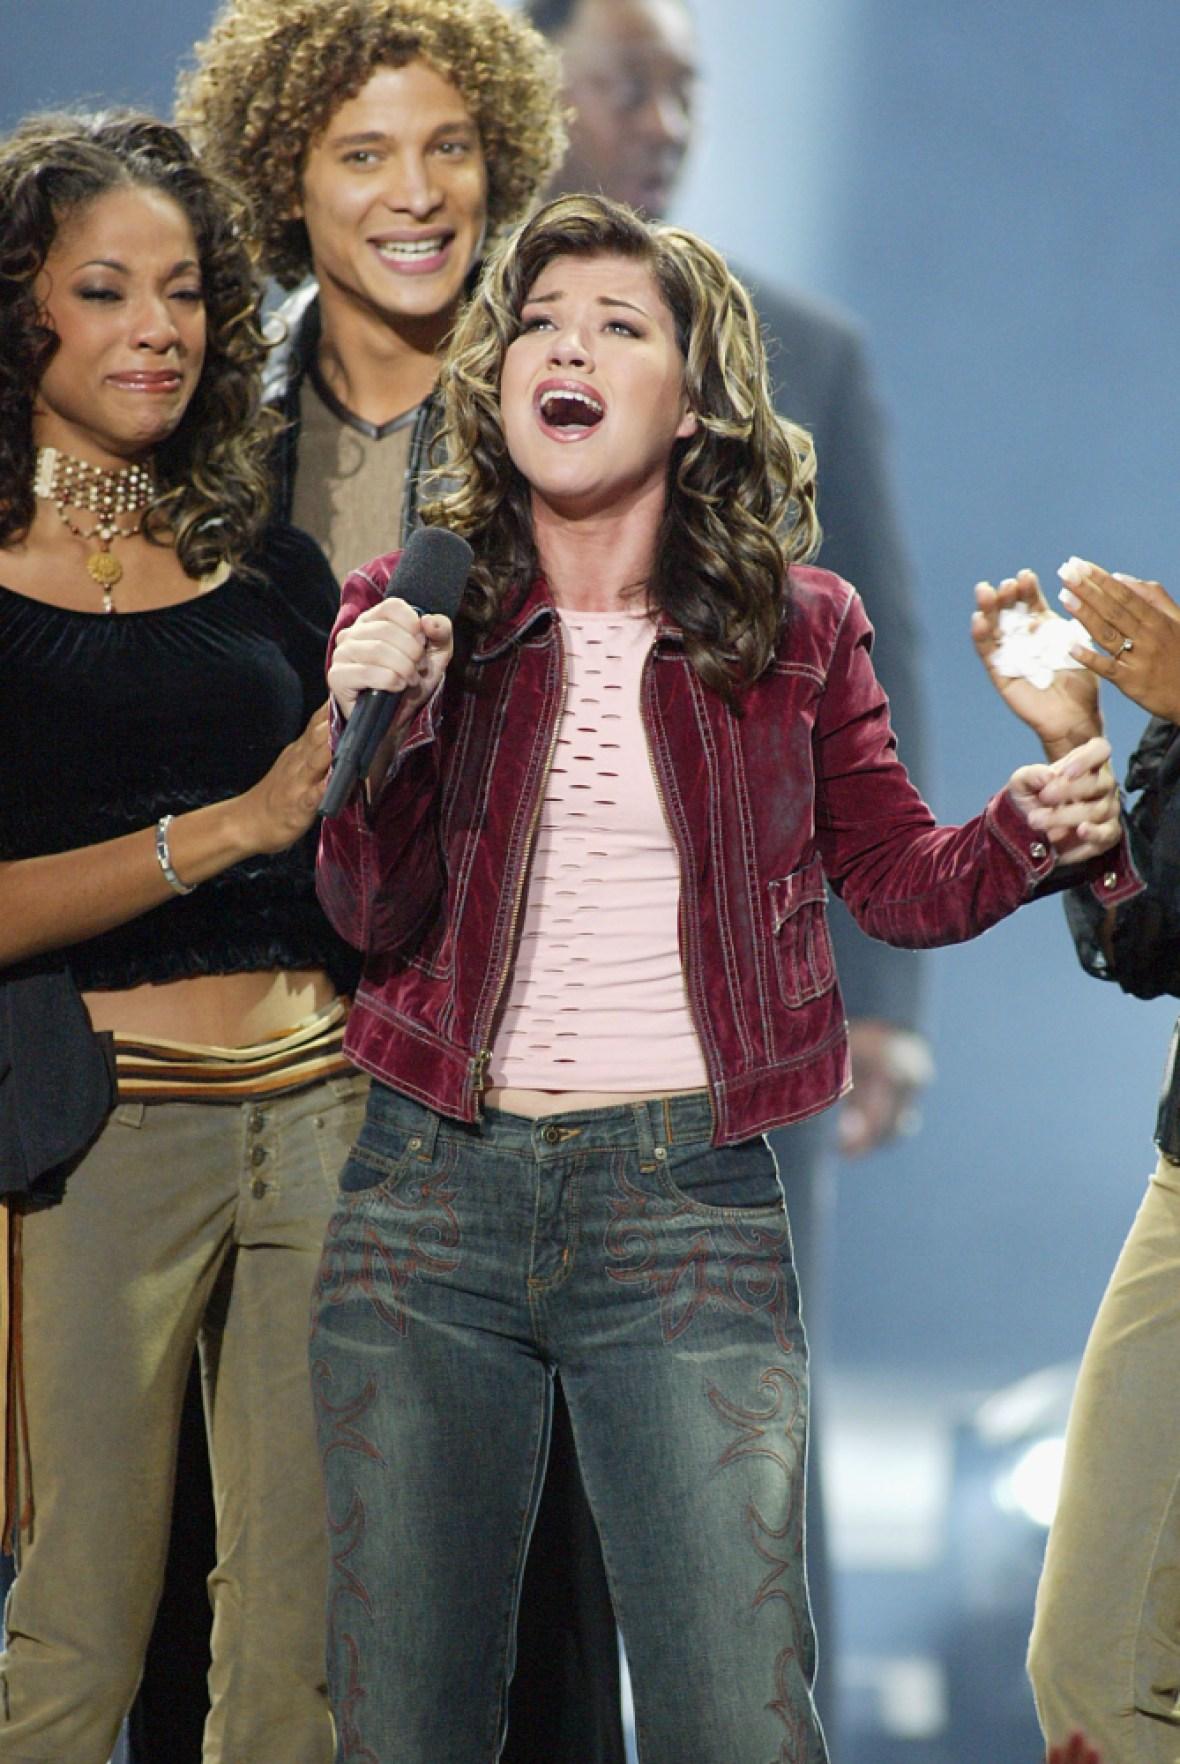 kelly clarkson 'american idol' getty images